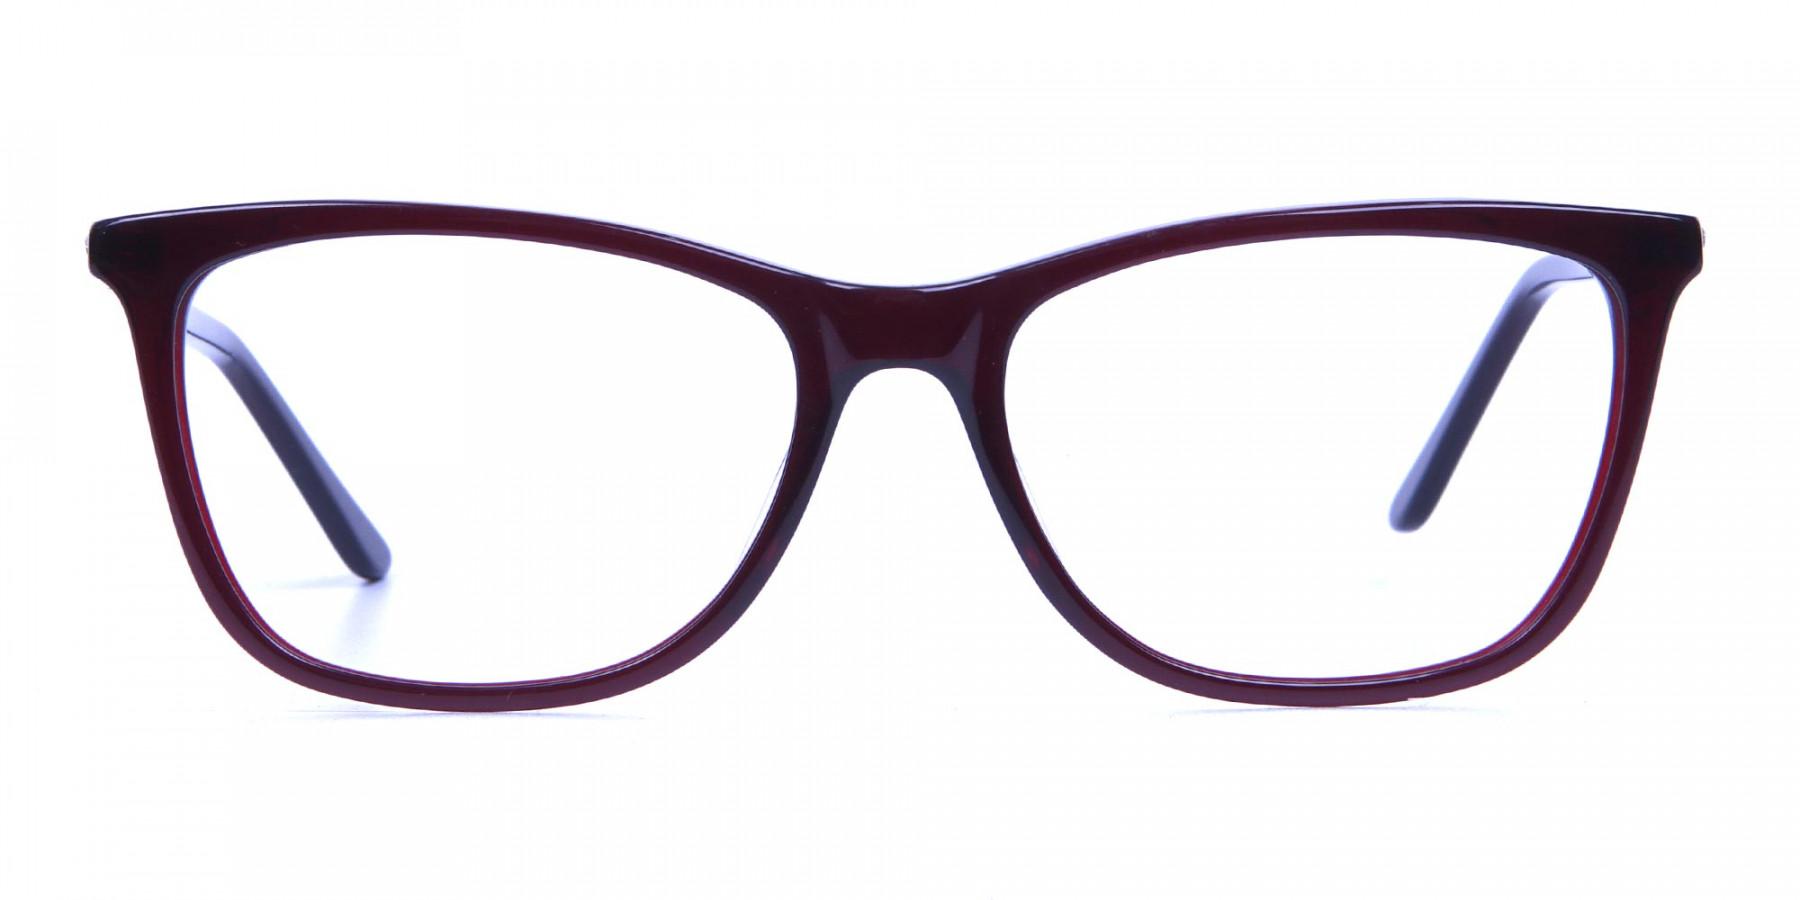 Modern Glasses in Dark Rain